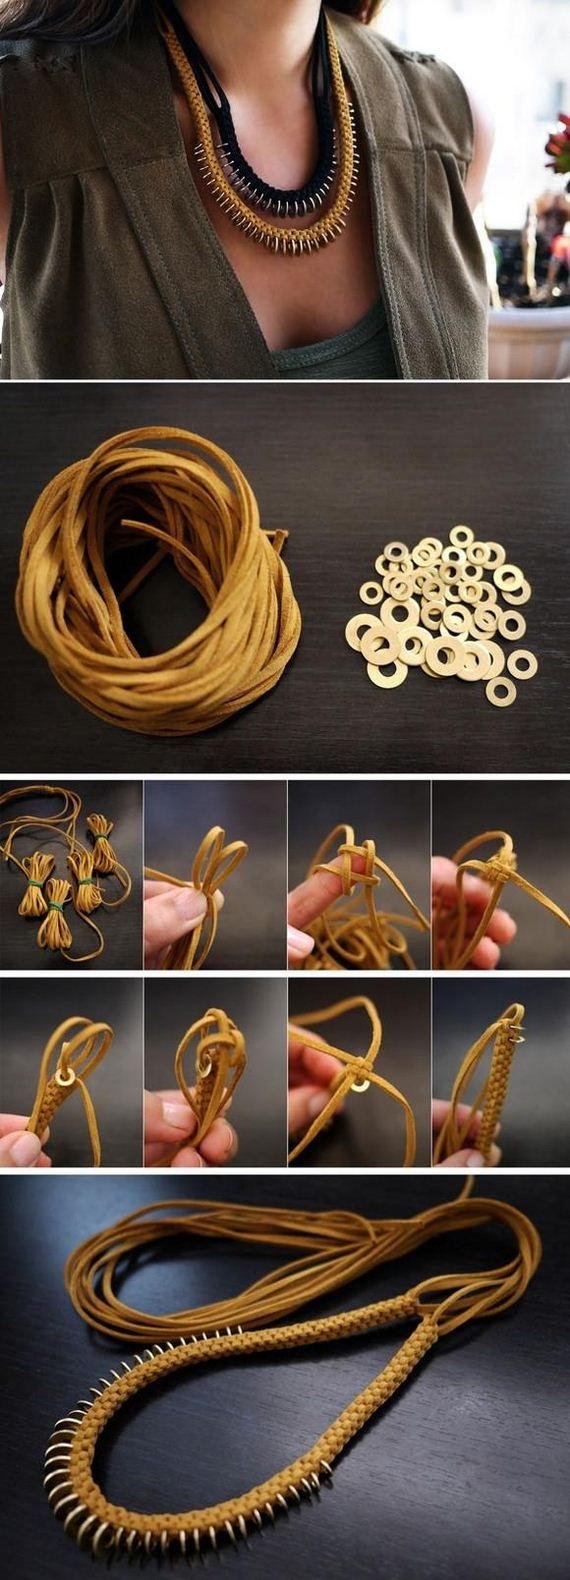 08-diy-statement-necklace-jewelry-tutorial-ideas